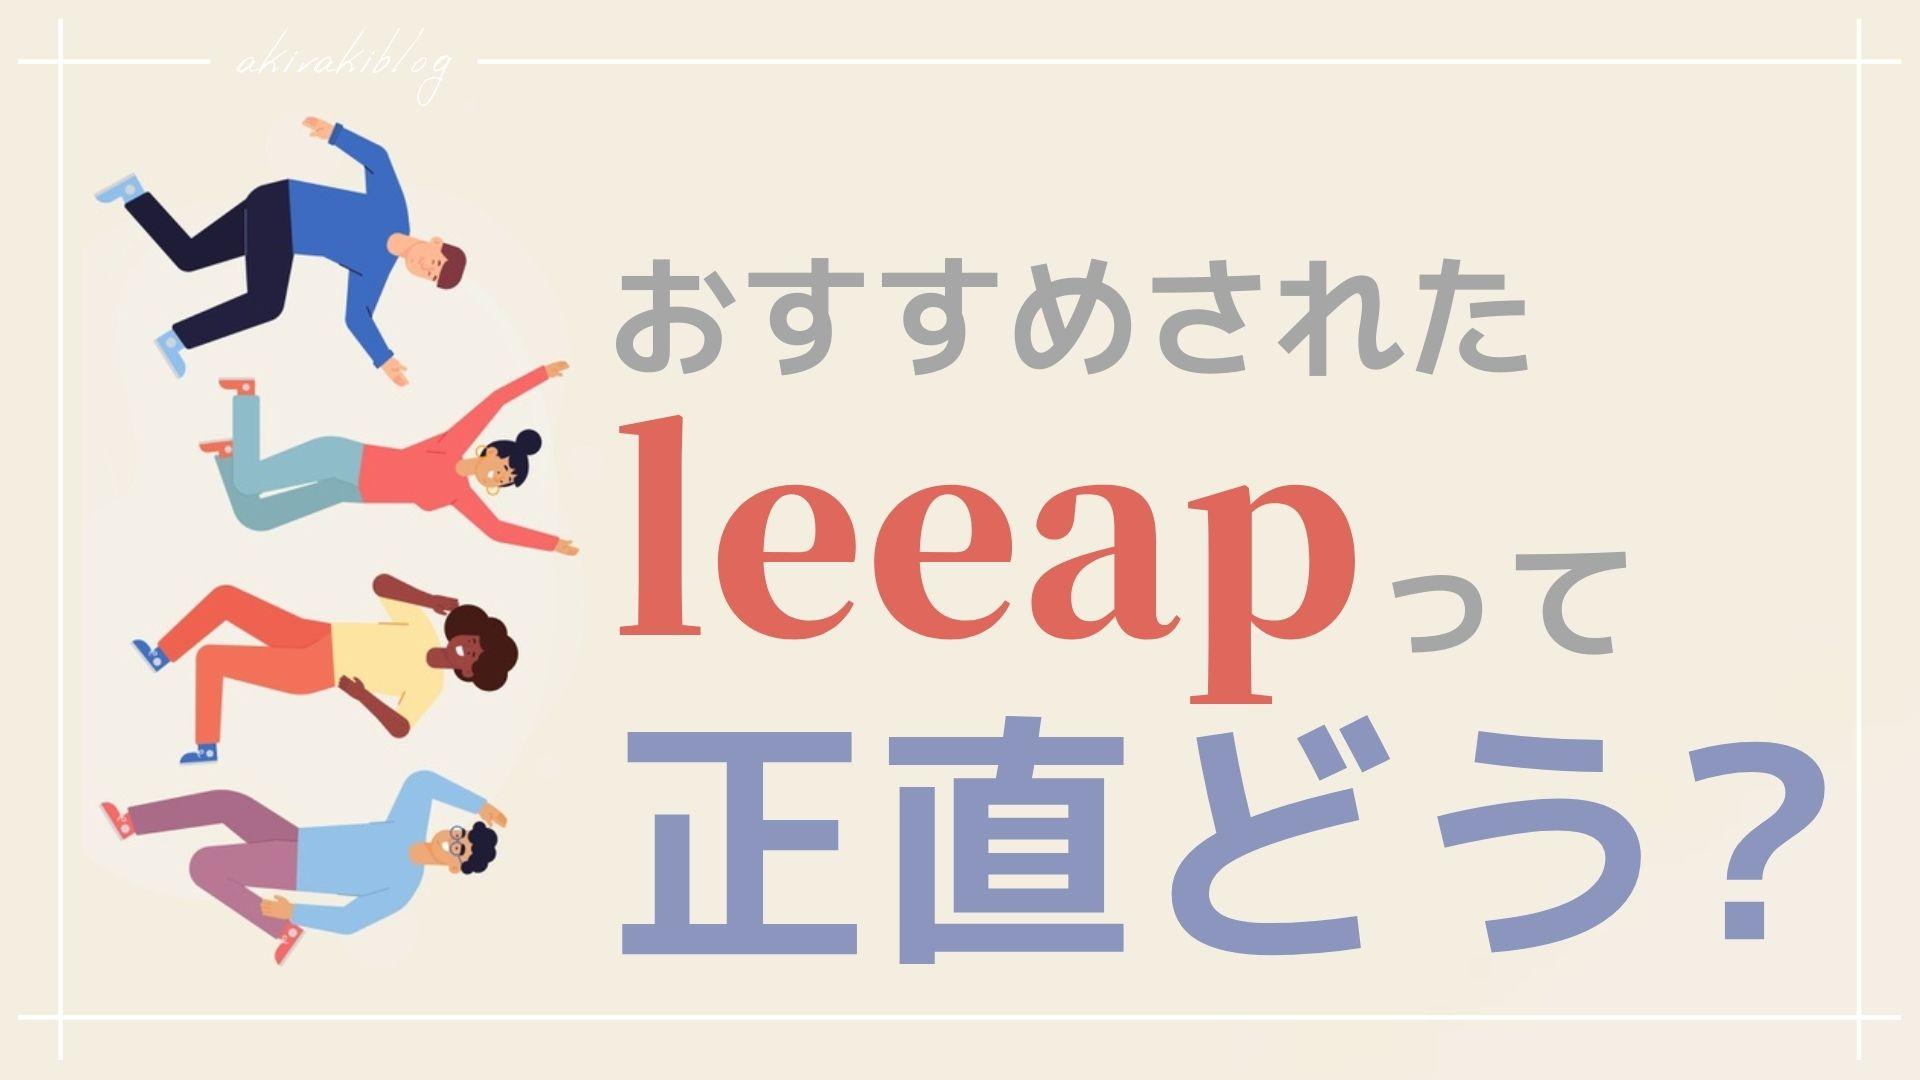 leeapの評判ってどうなの?